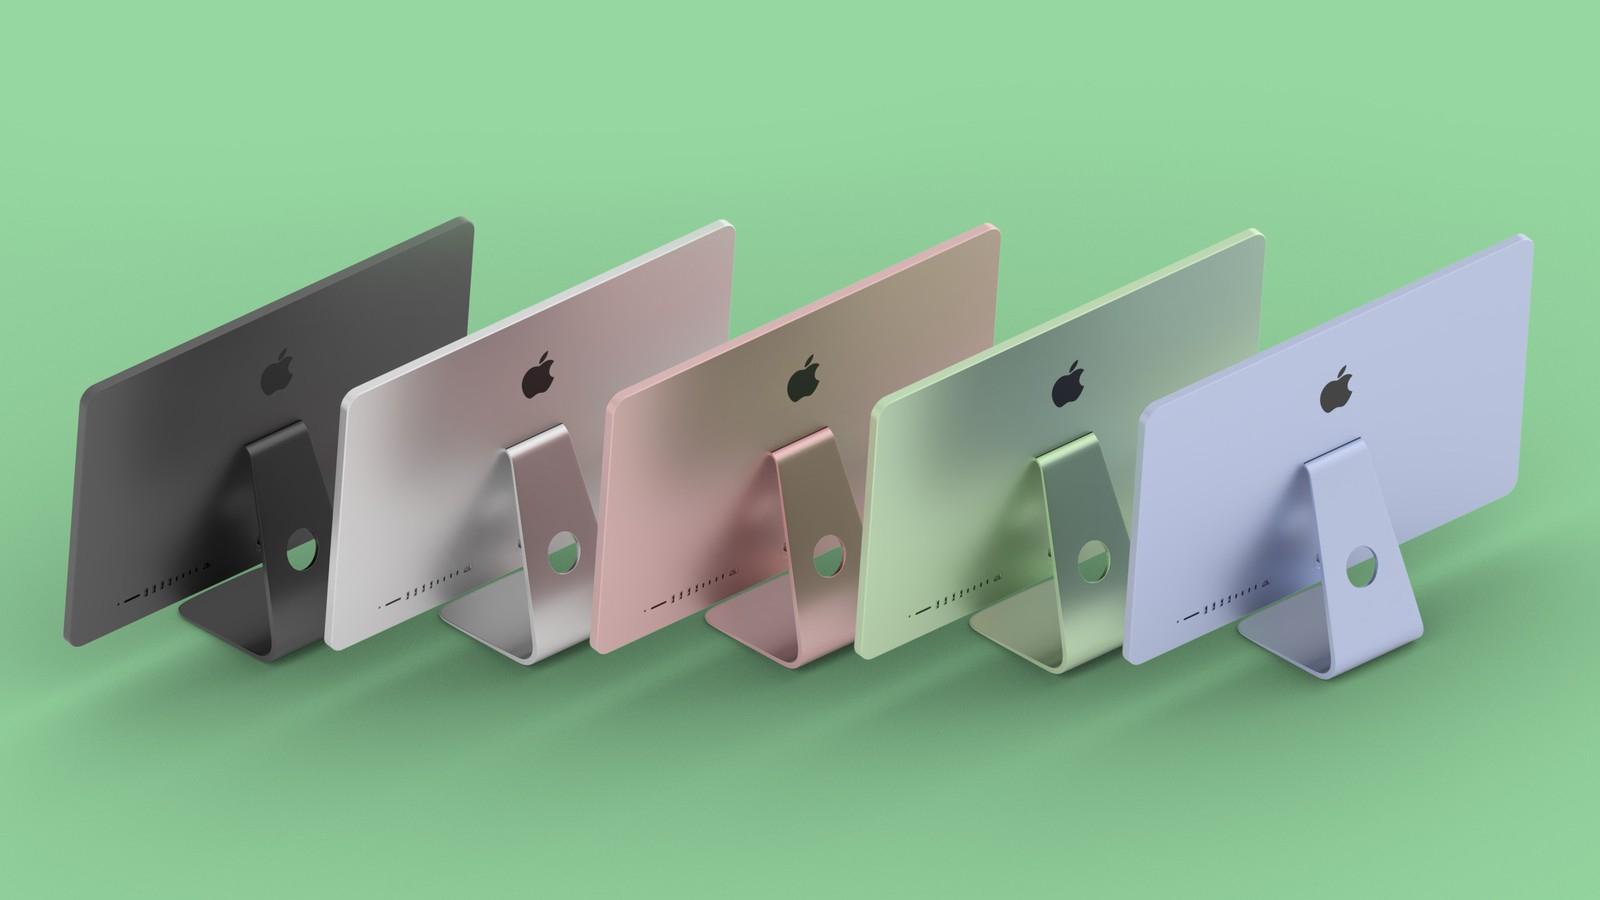 iMac M1: Nuovo Design